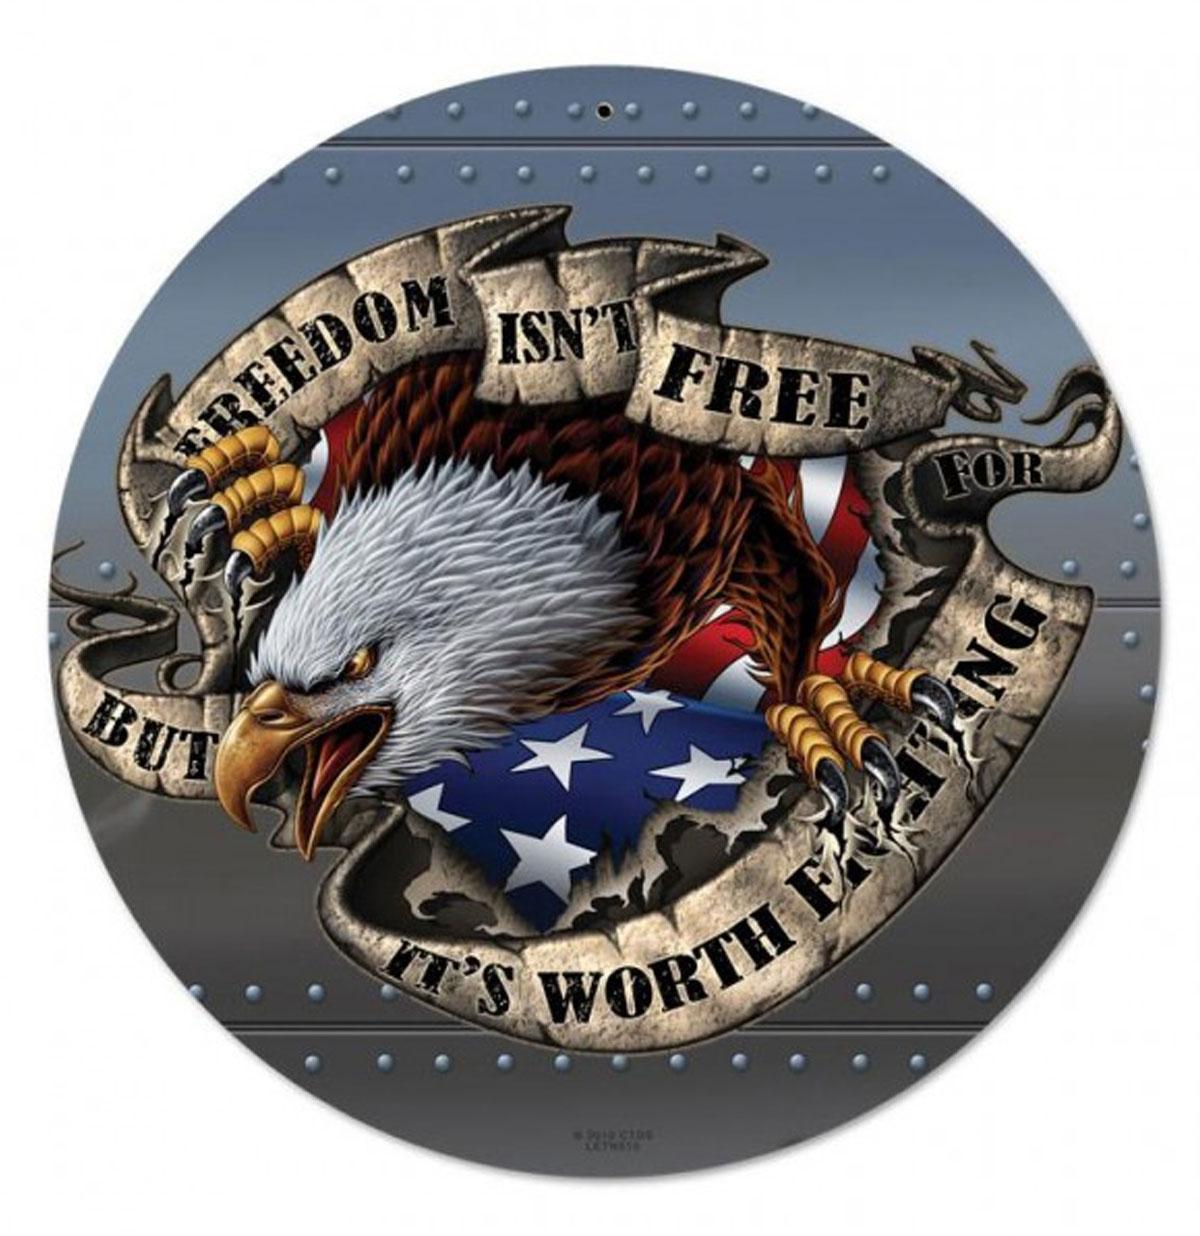 Freedom Isn't Free But It's Worth Fighting For Rond Zwaar Metalen Bord 35 cm ø